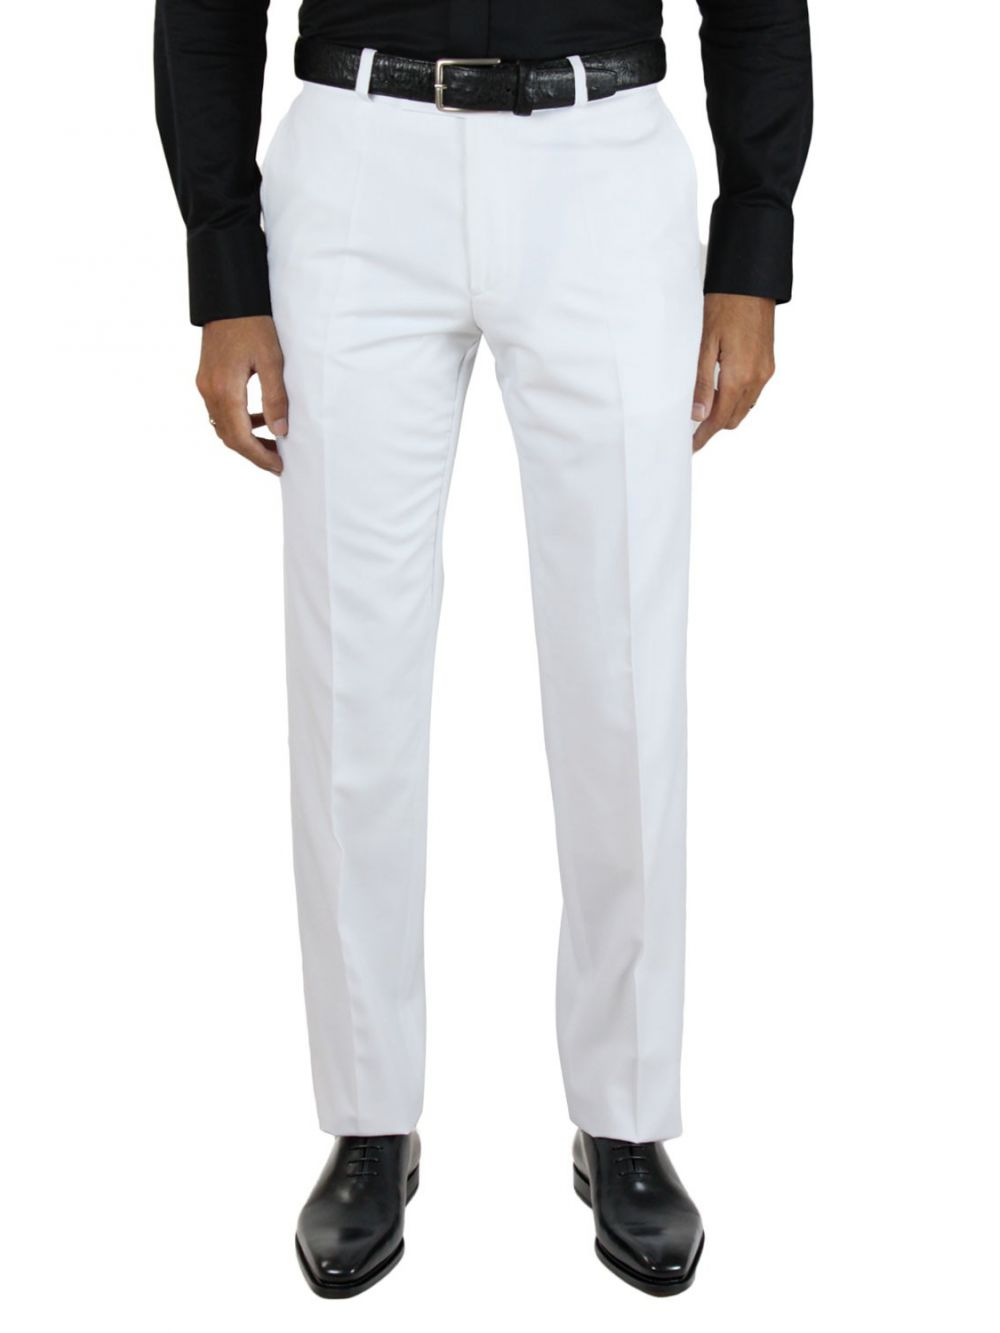 pantalon blanc pas cher kebello com. Black Bedroom Furniture Sets. Home Design Ideas